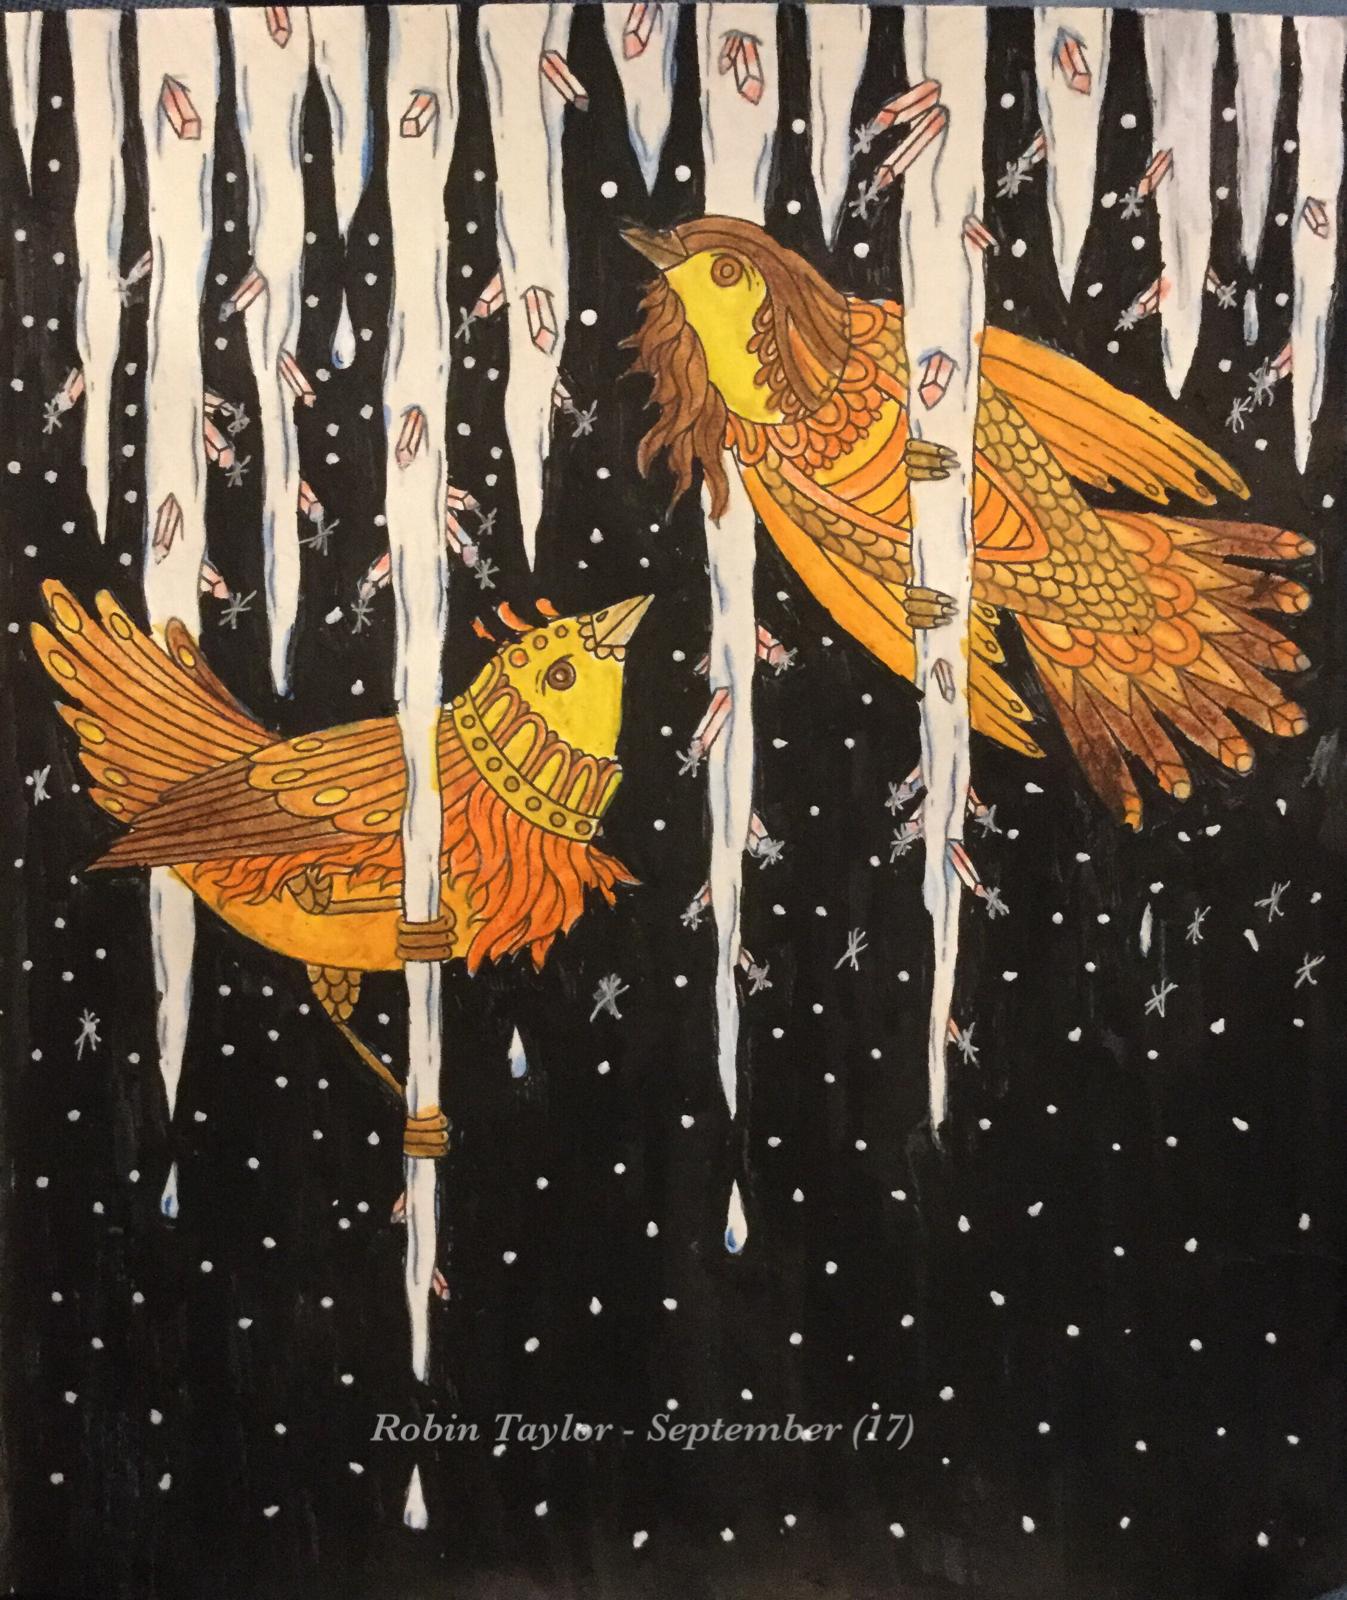 Tidevarv Seasons By Hanna Karlzon Colored With Derwent Inktense Pencils Posca Background Colorist Robin Taylor